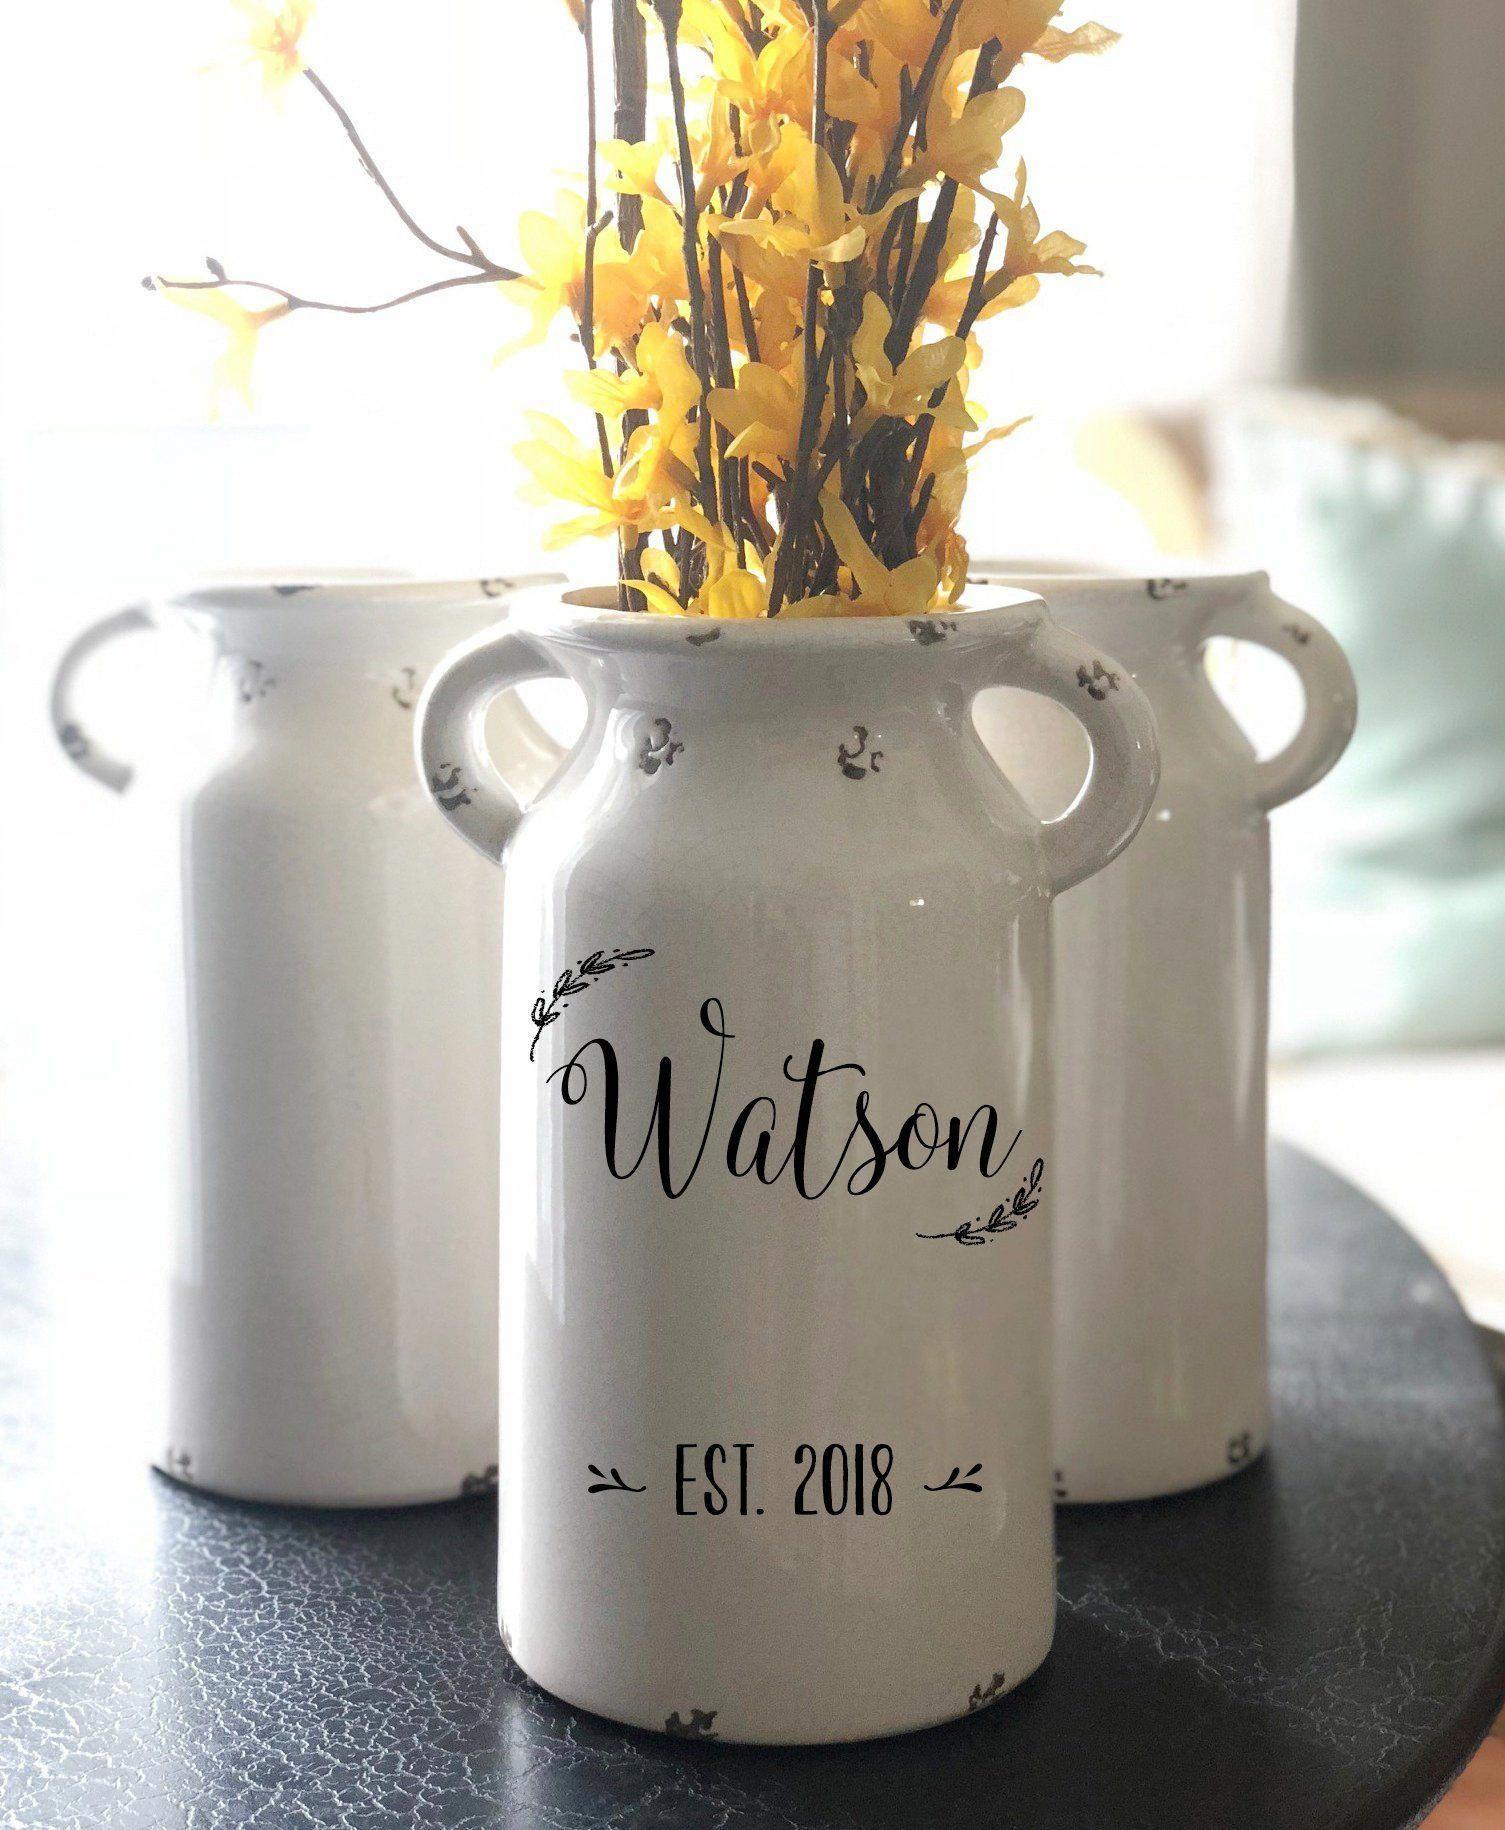 Personalized milk jug vase farmhouse decor, rustic decor